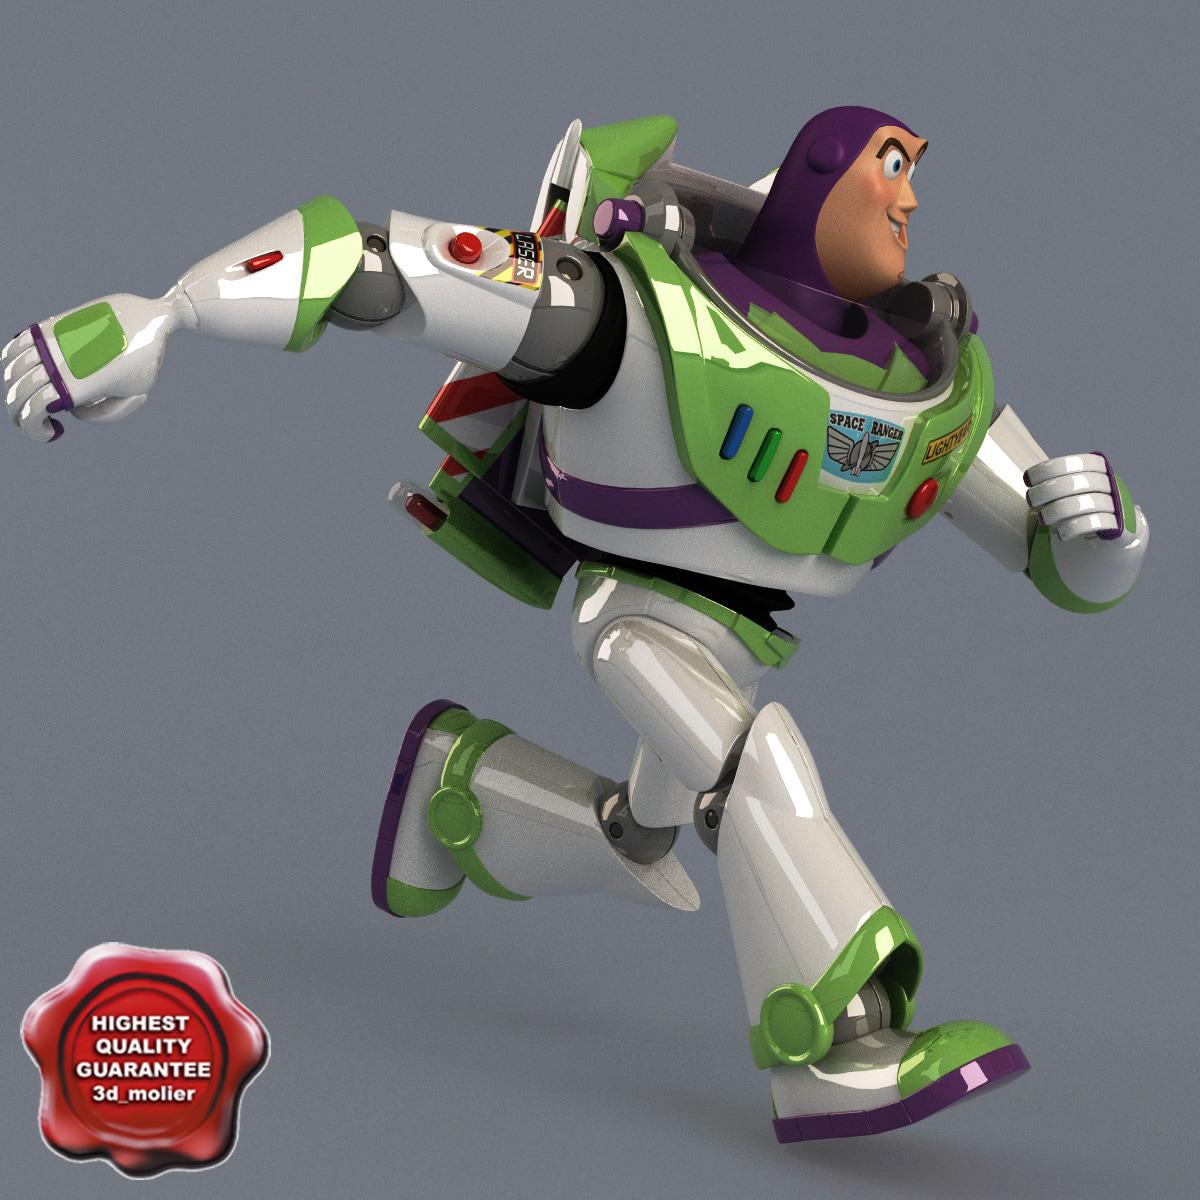 Buzz Lightyear Pose 5